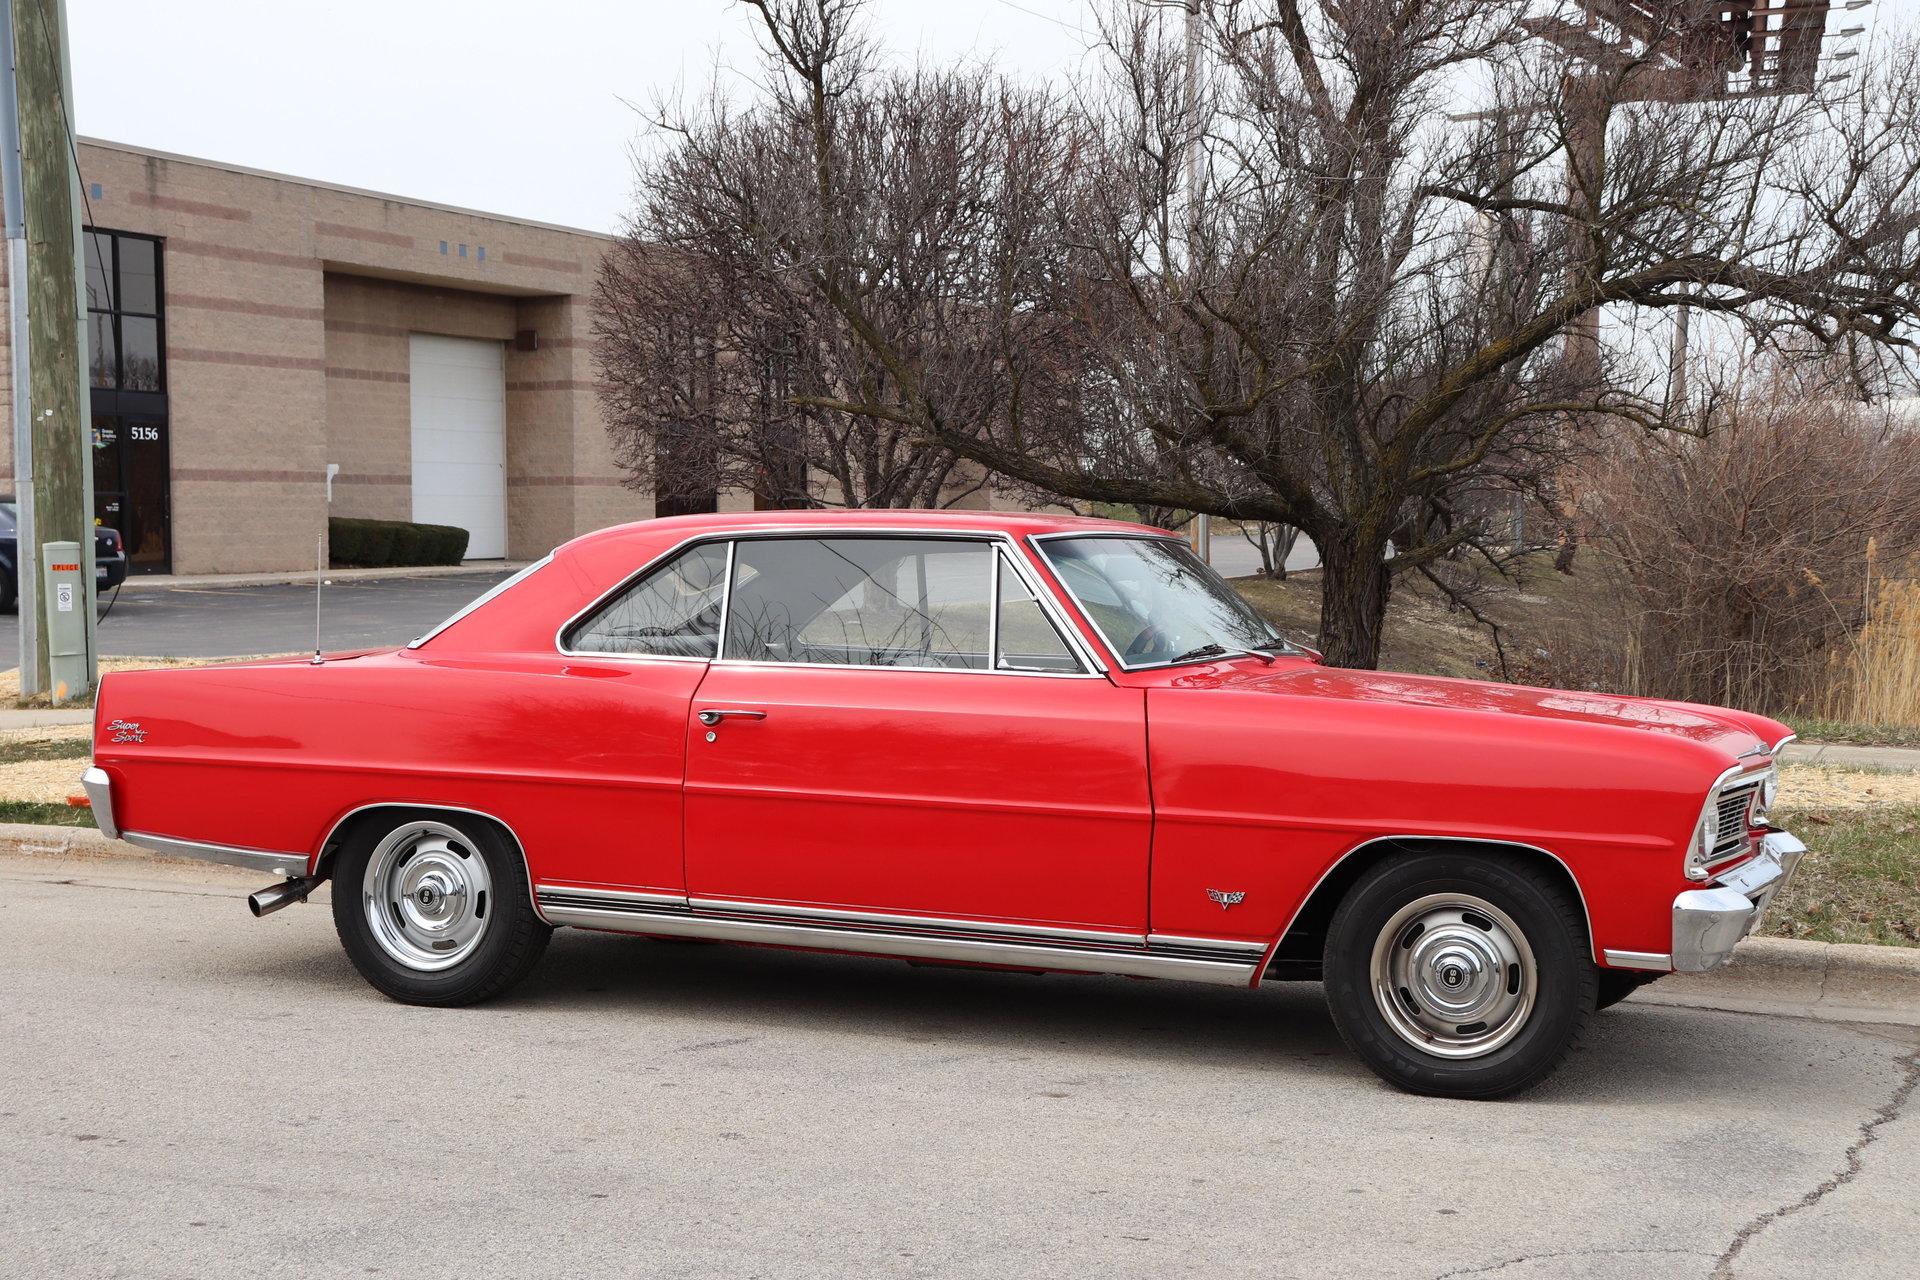 51204e6f68e7d hd 1966 chevrolet nova super sport